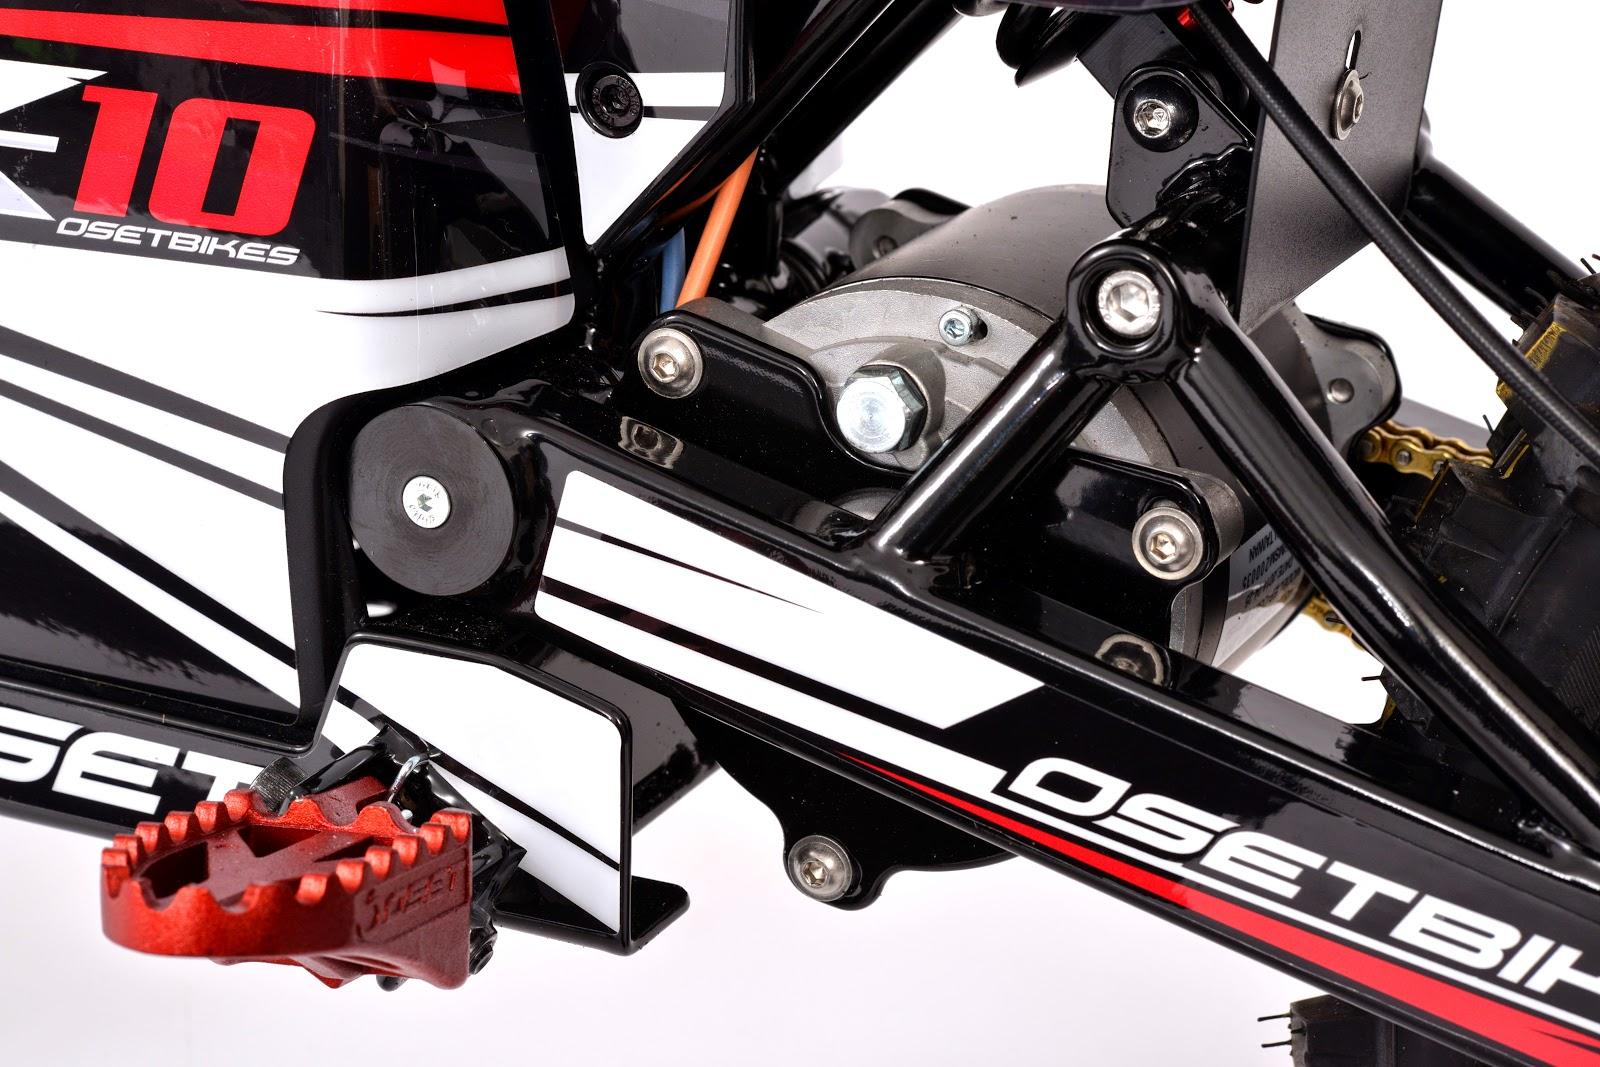 DSC_5536.JPG: Motor